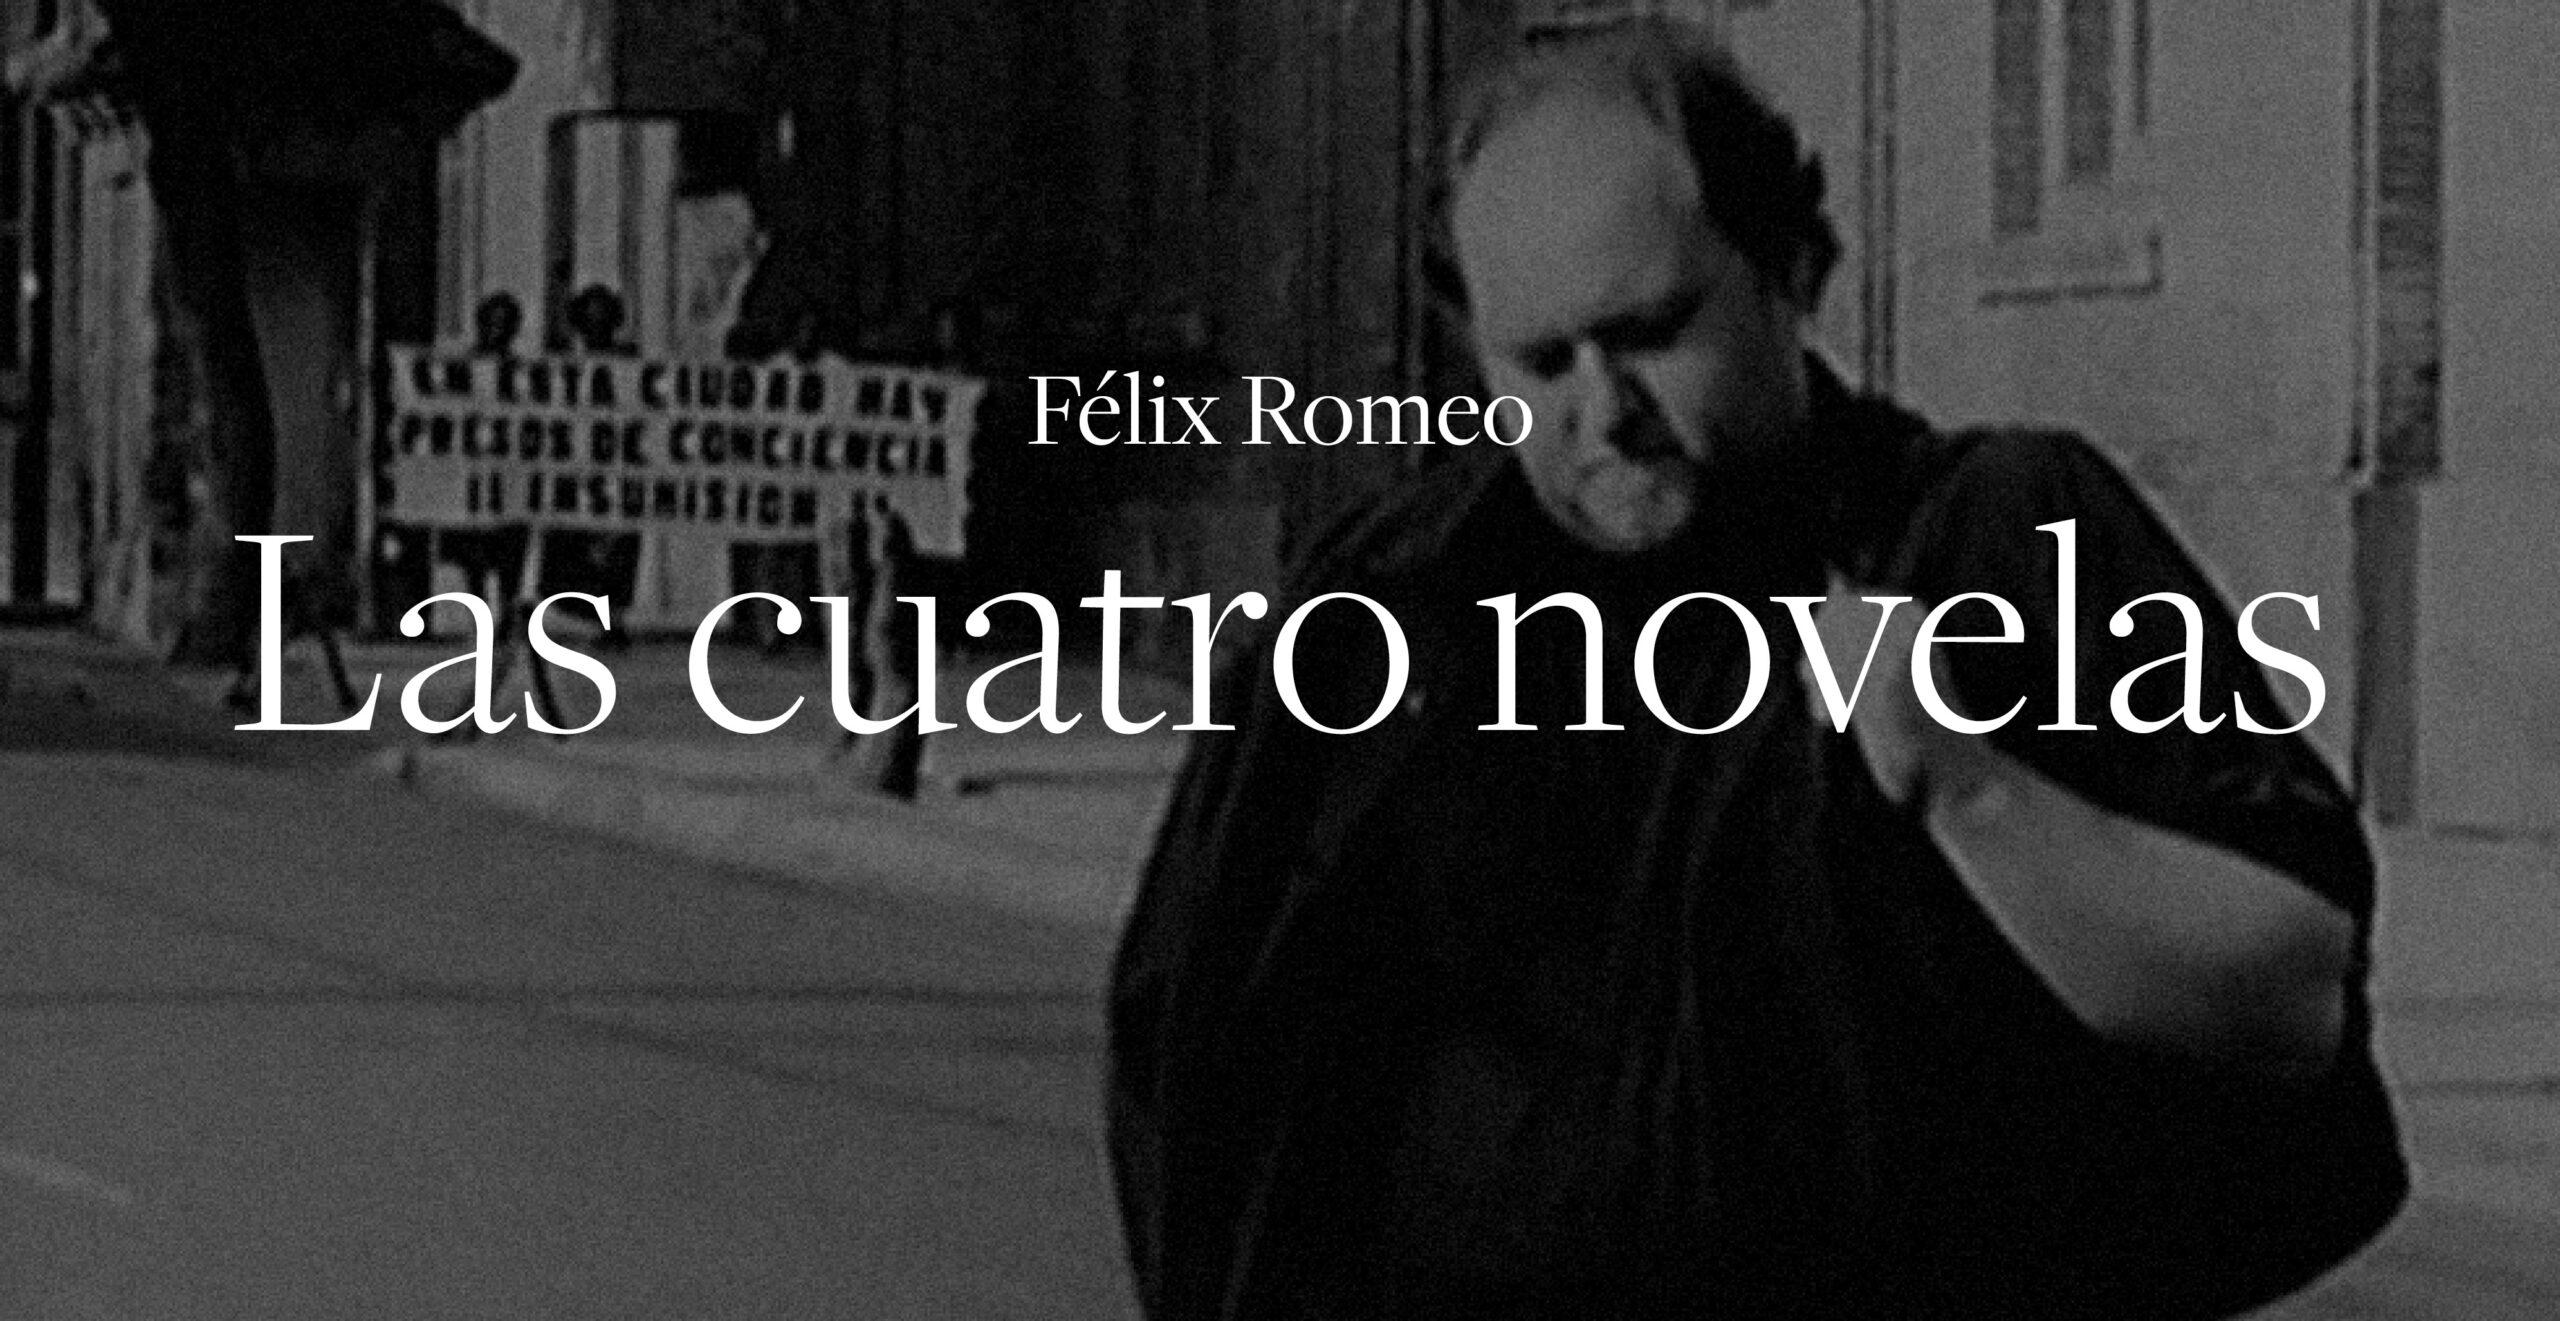 Las cuatro novelas Félix Romeo